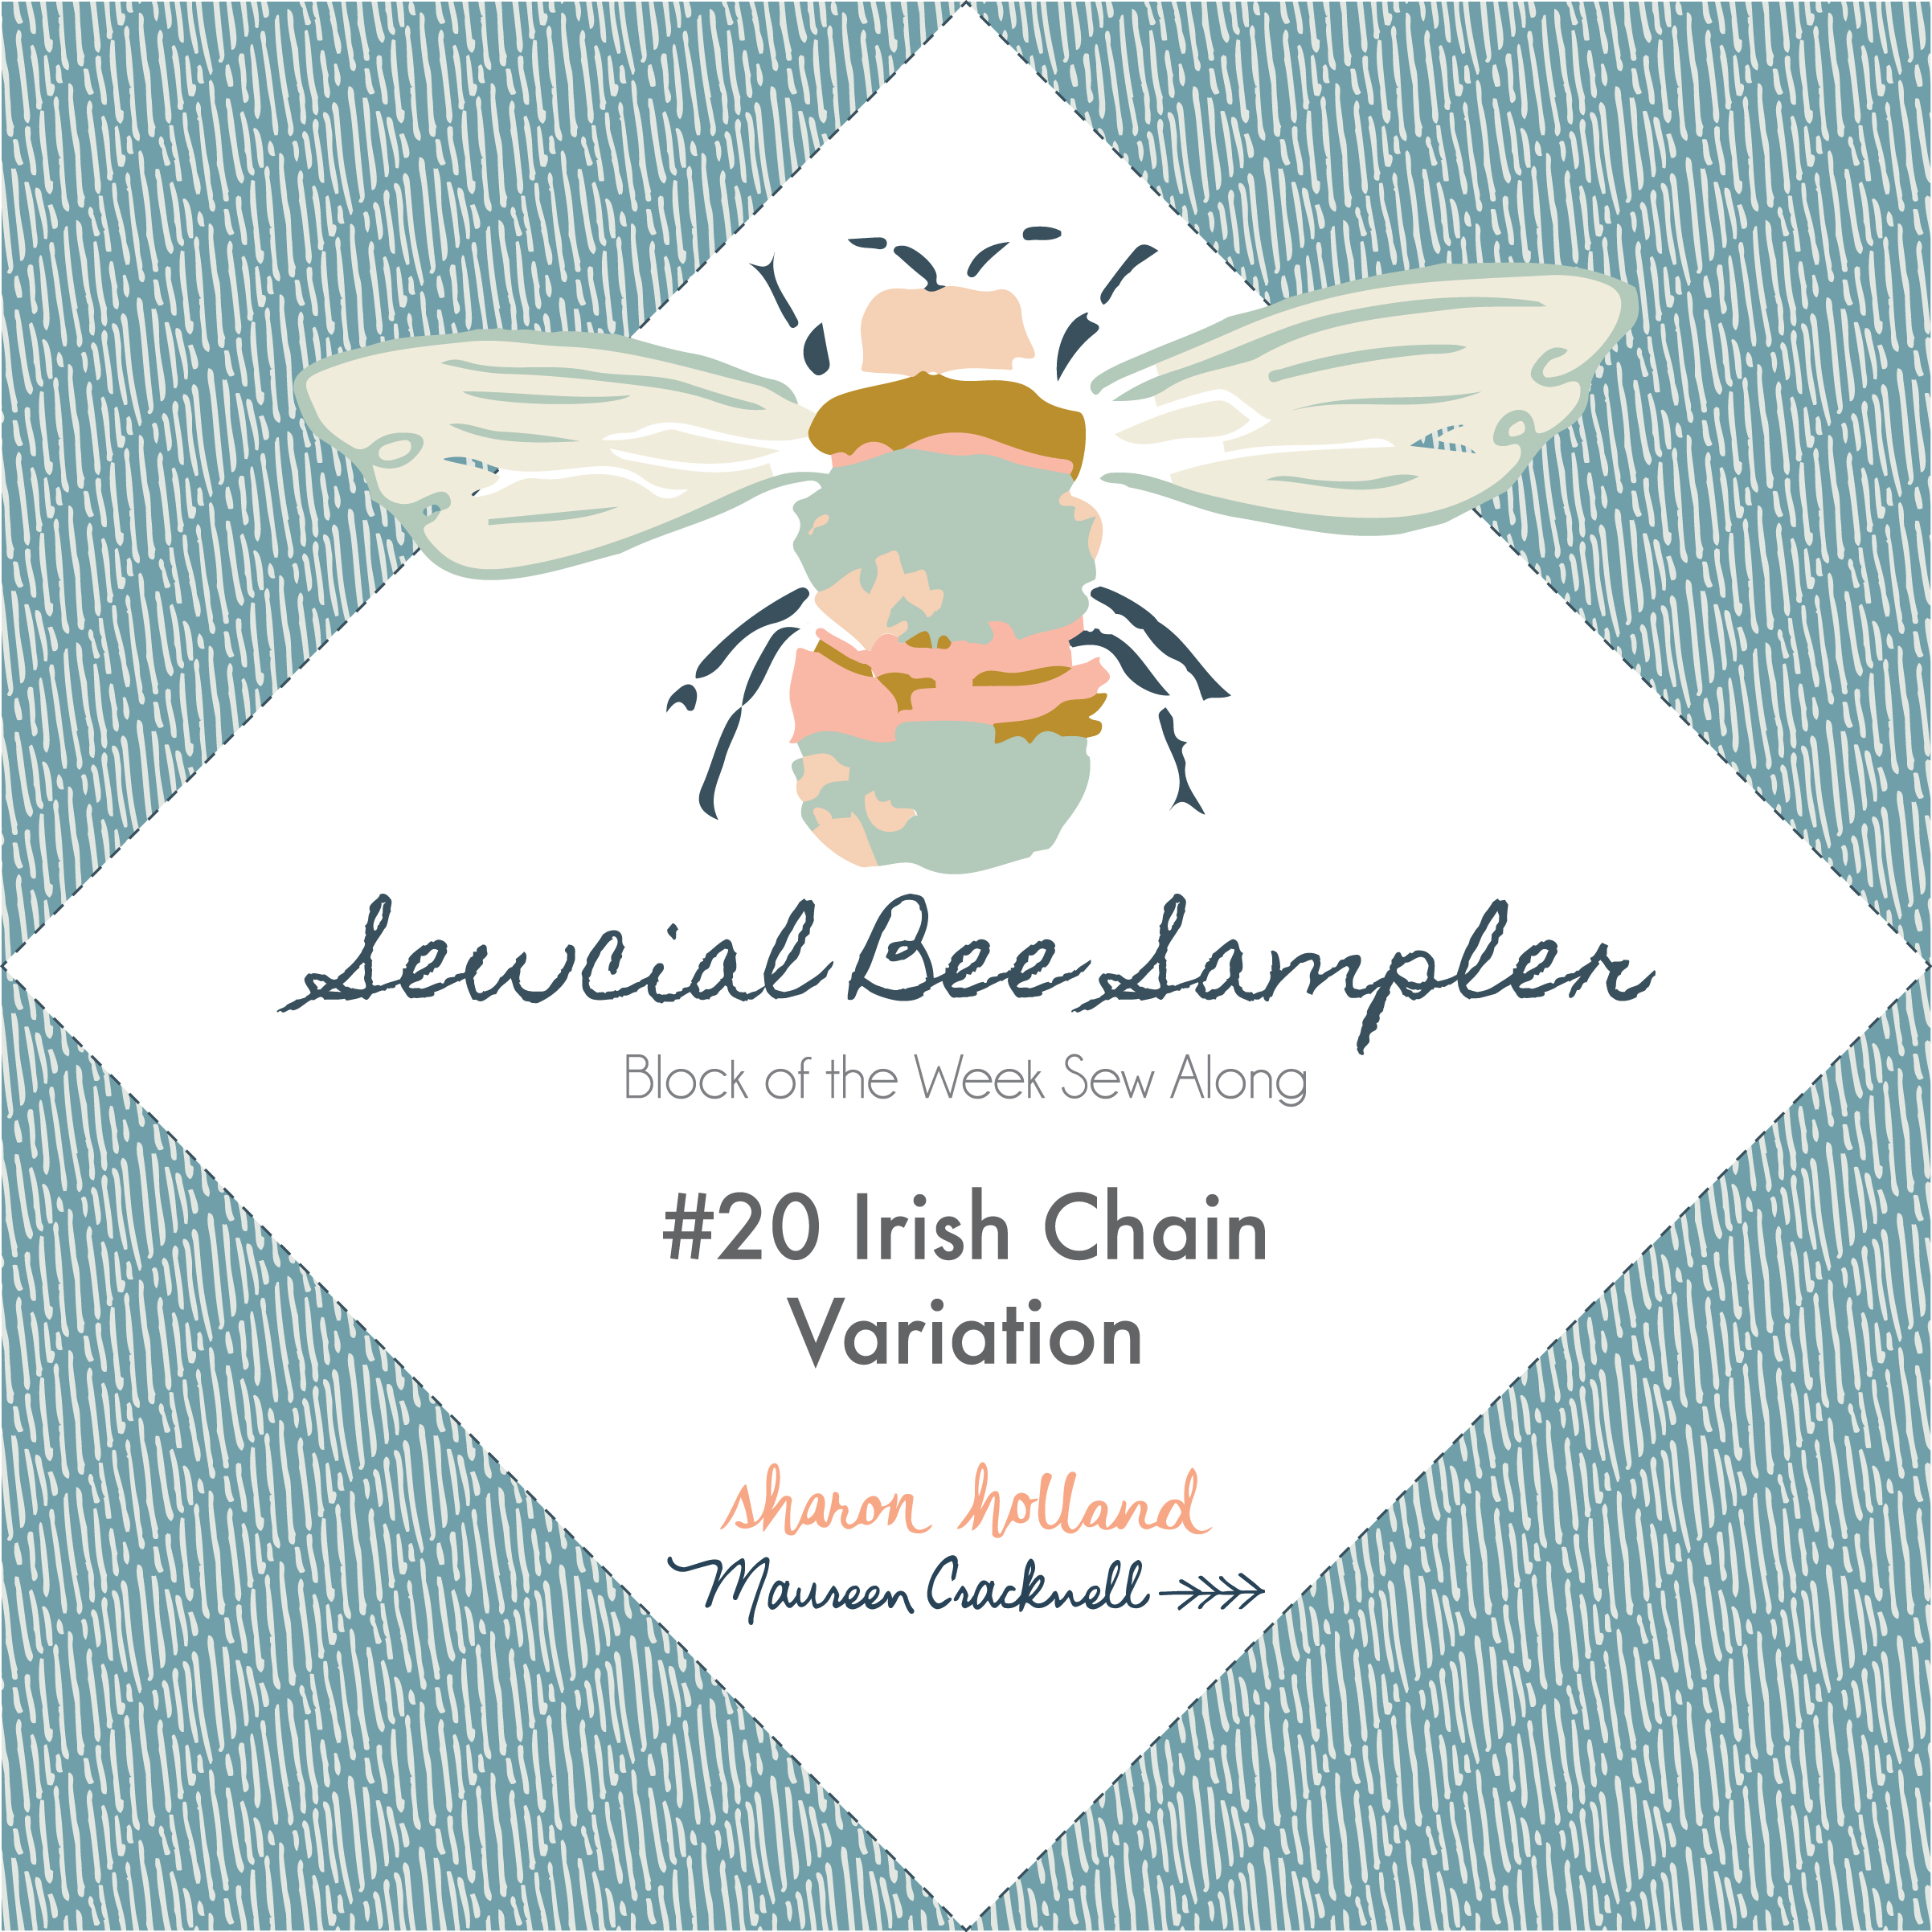 Sewcial Bee Sampler #20-01.jpg